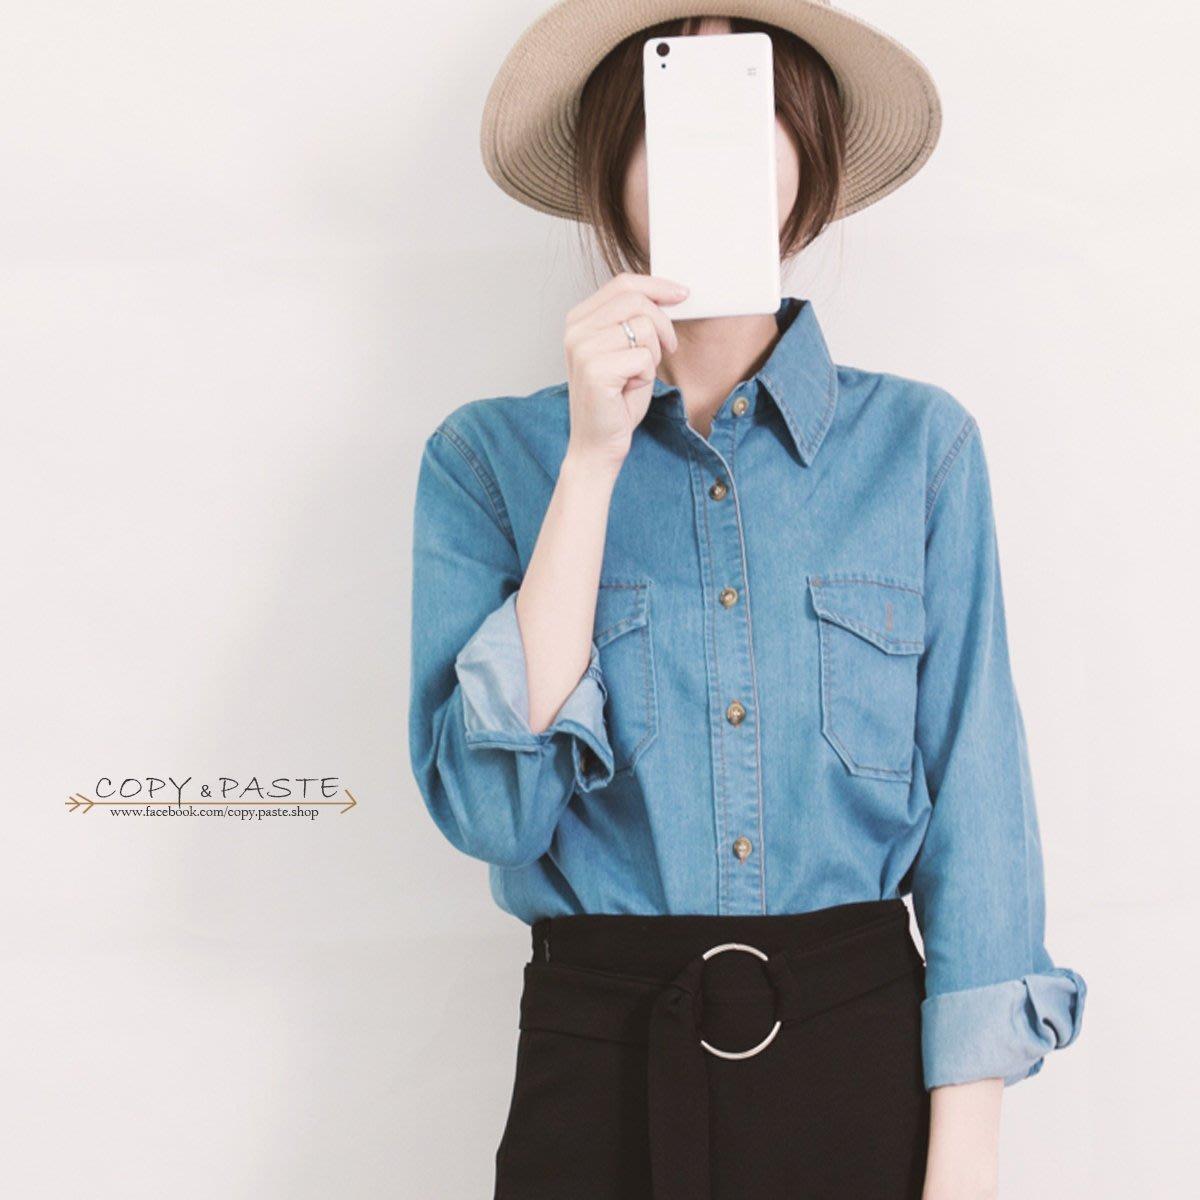 Copy&Paste【C50】韓國訂單.四季百搭顯瘦修身休閒歐美經典牛仔丹寧襯衫上衣外套 S~XL 特價 (M現貨)